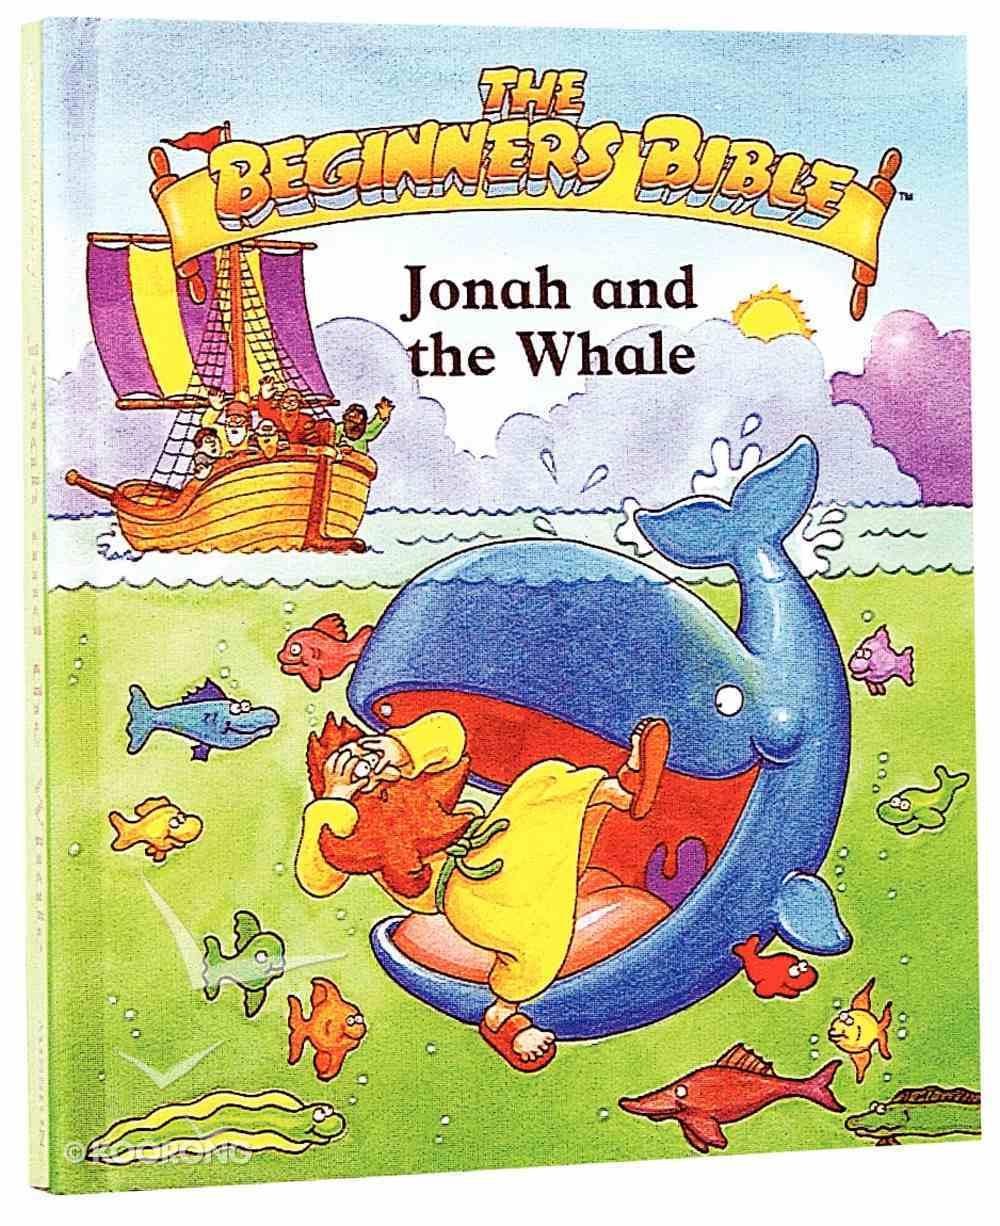 Jonah and the Whale (Beginner's Bible Series) Hardback